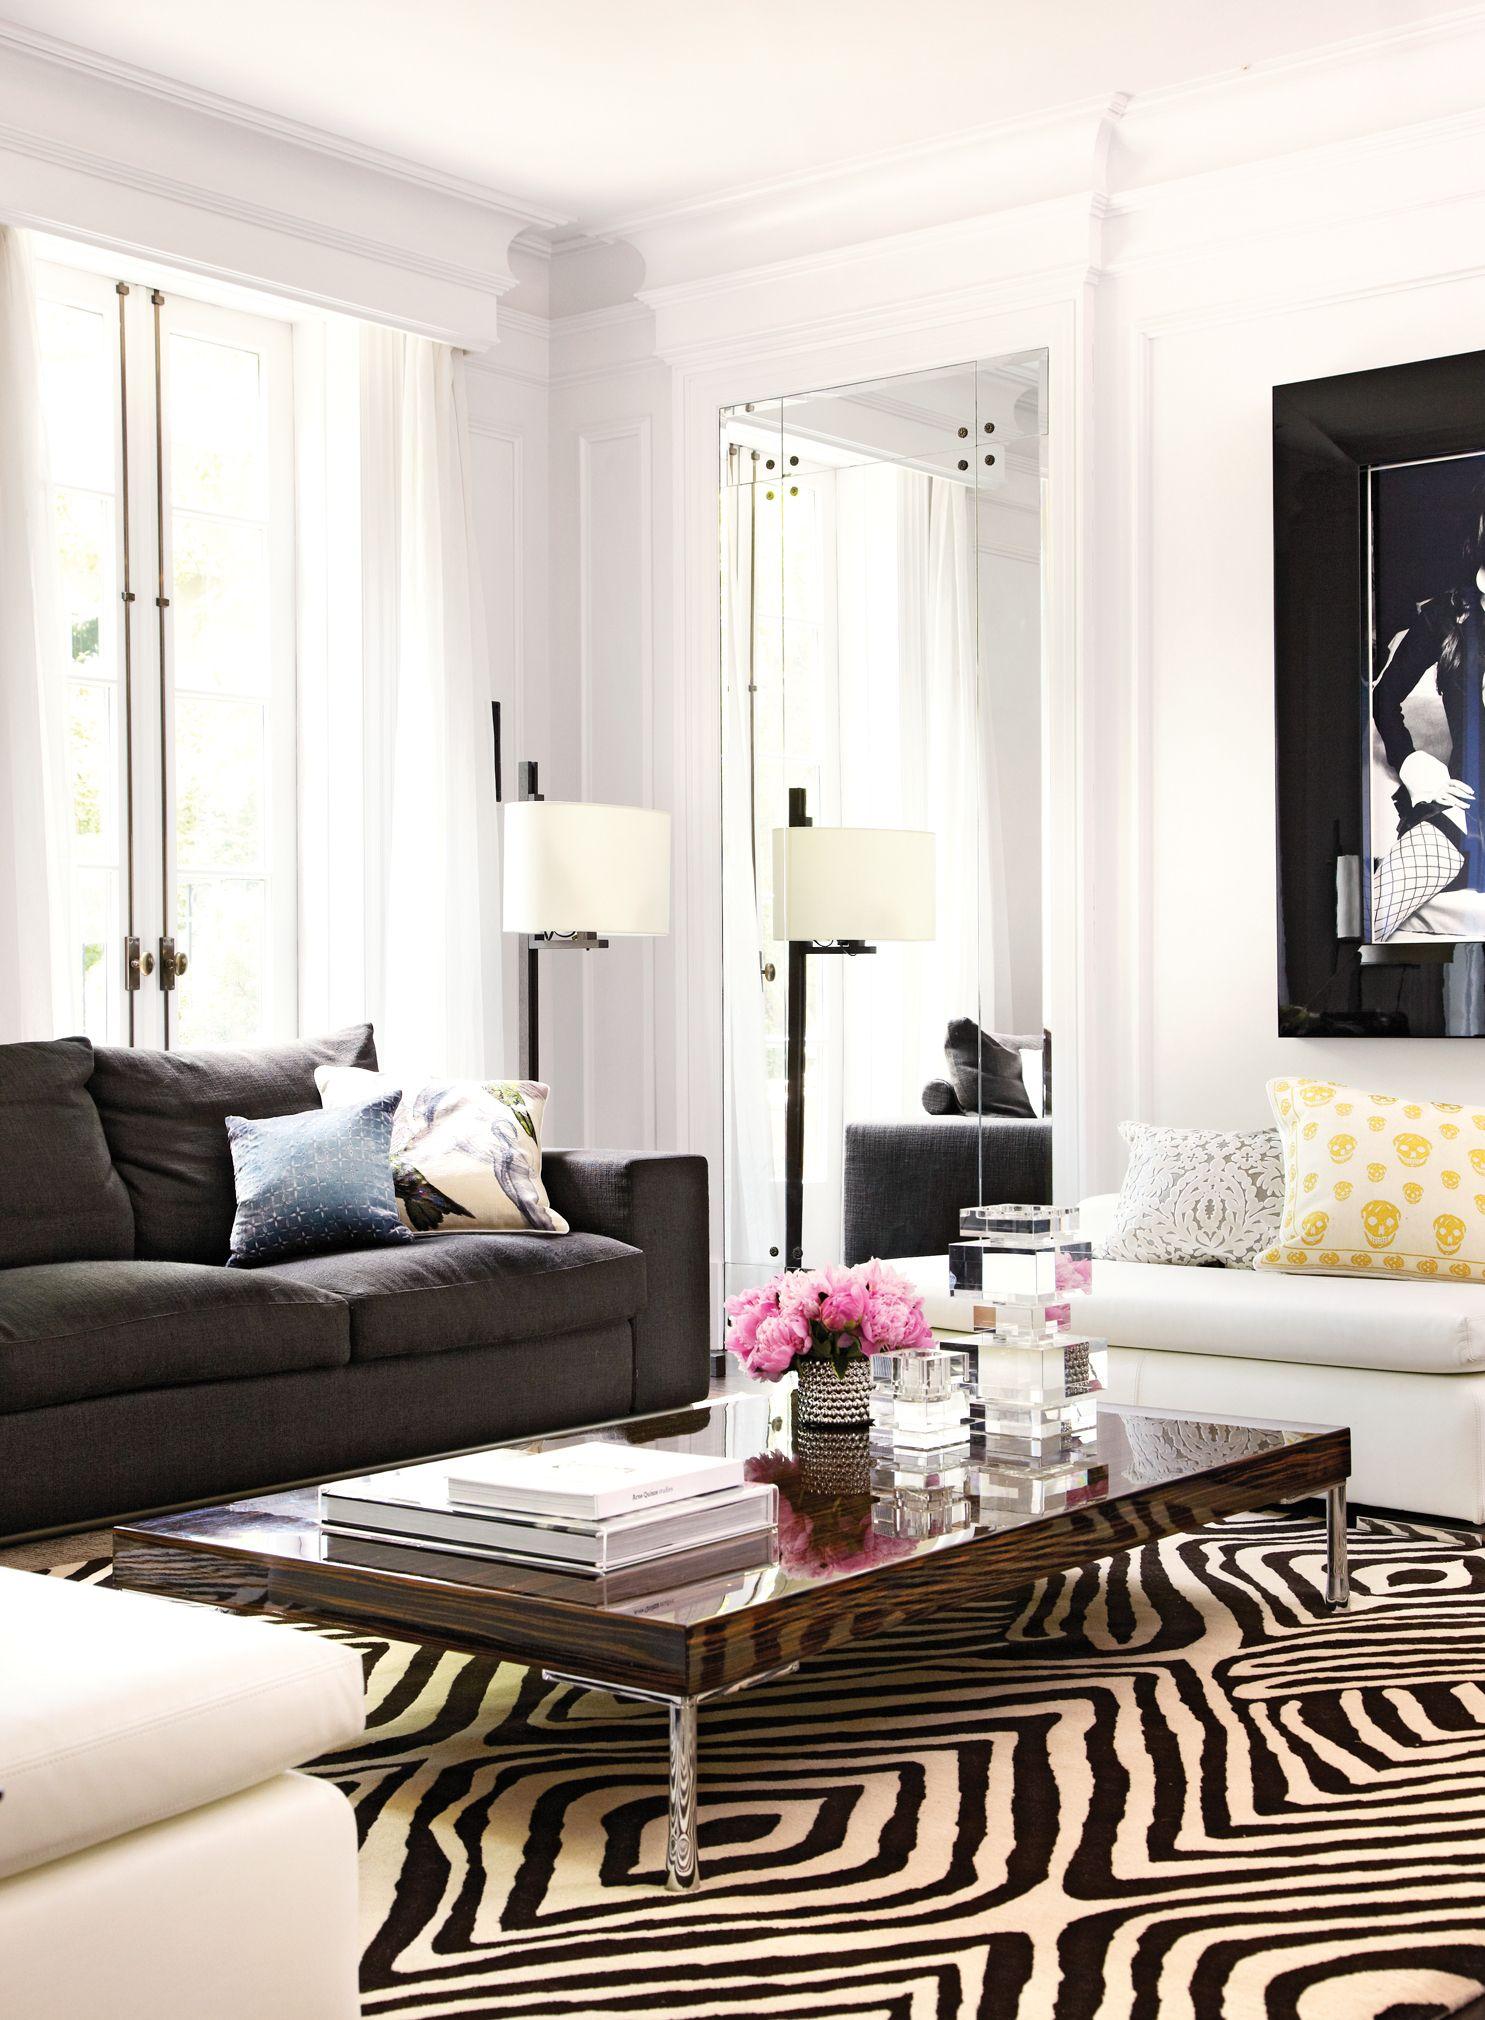 10 tips to glamorous interior design | Lush garden, Glass doors and LUSH